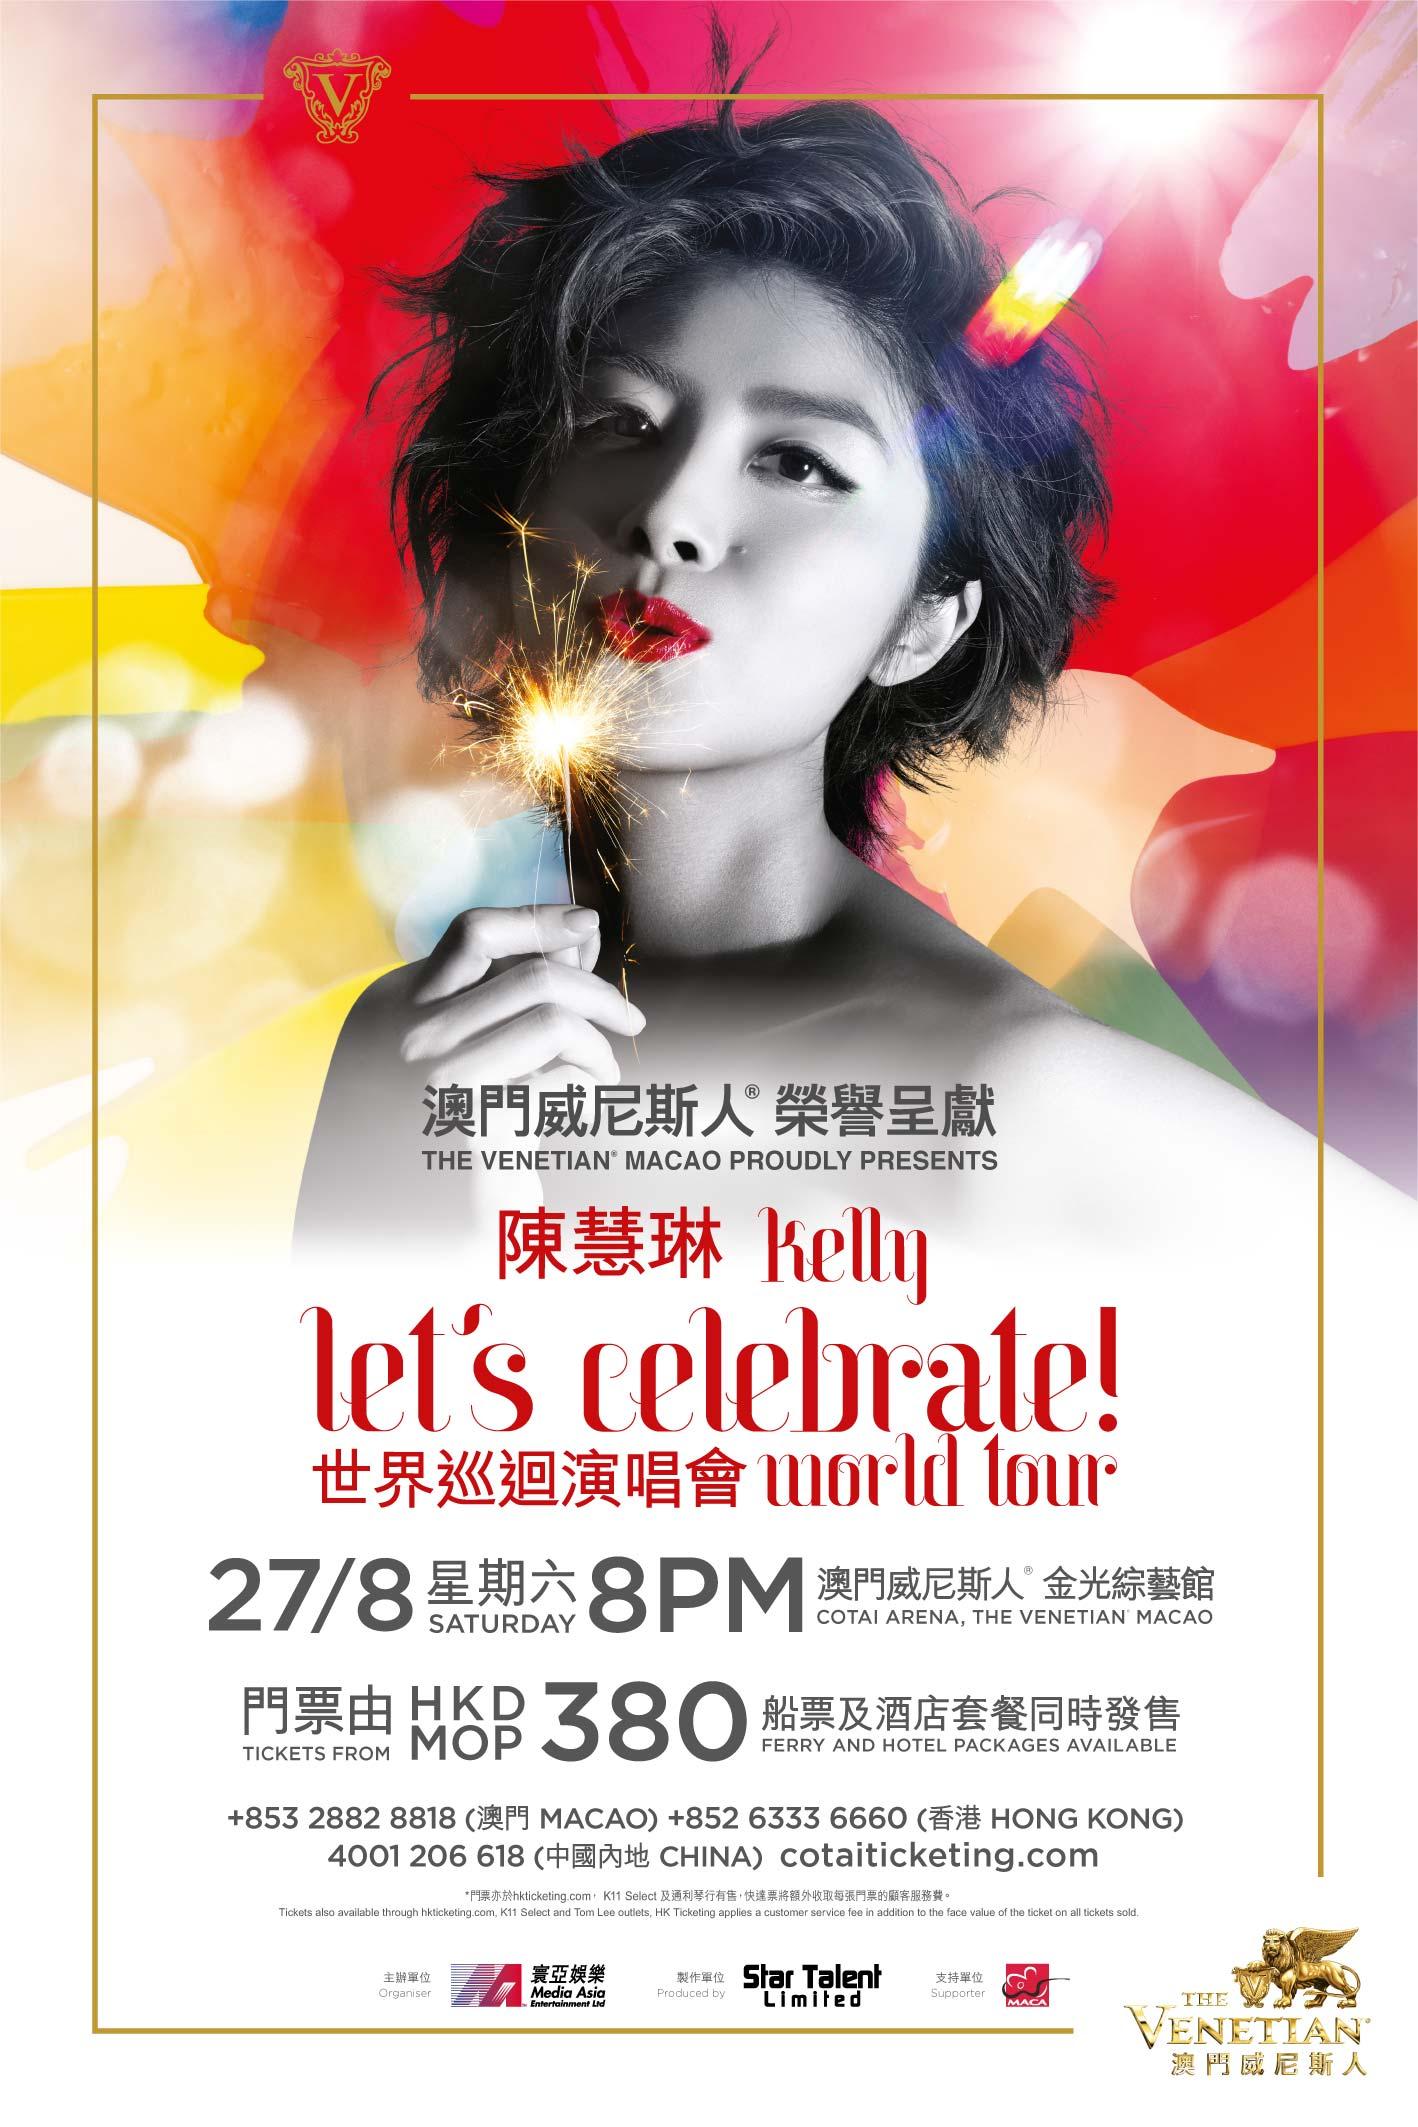 Kelly let's celebrate ! world tour